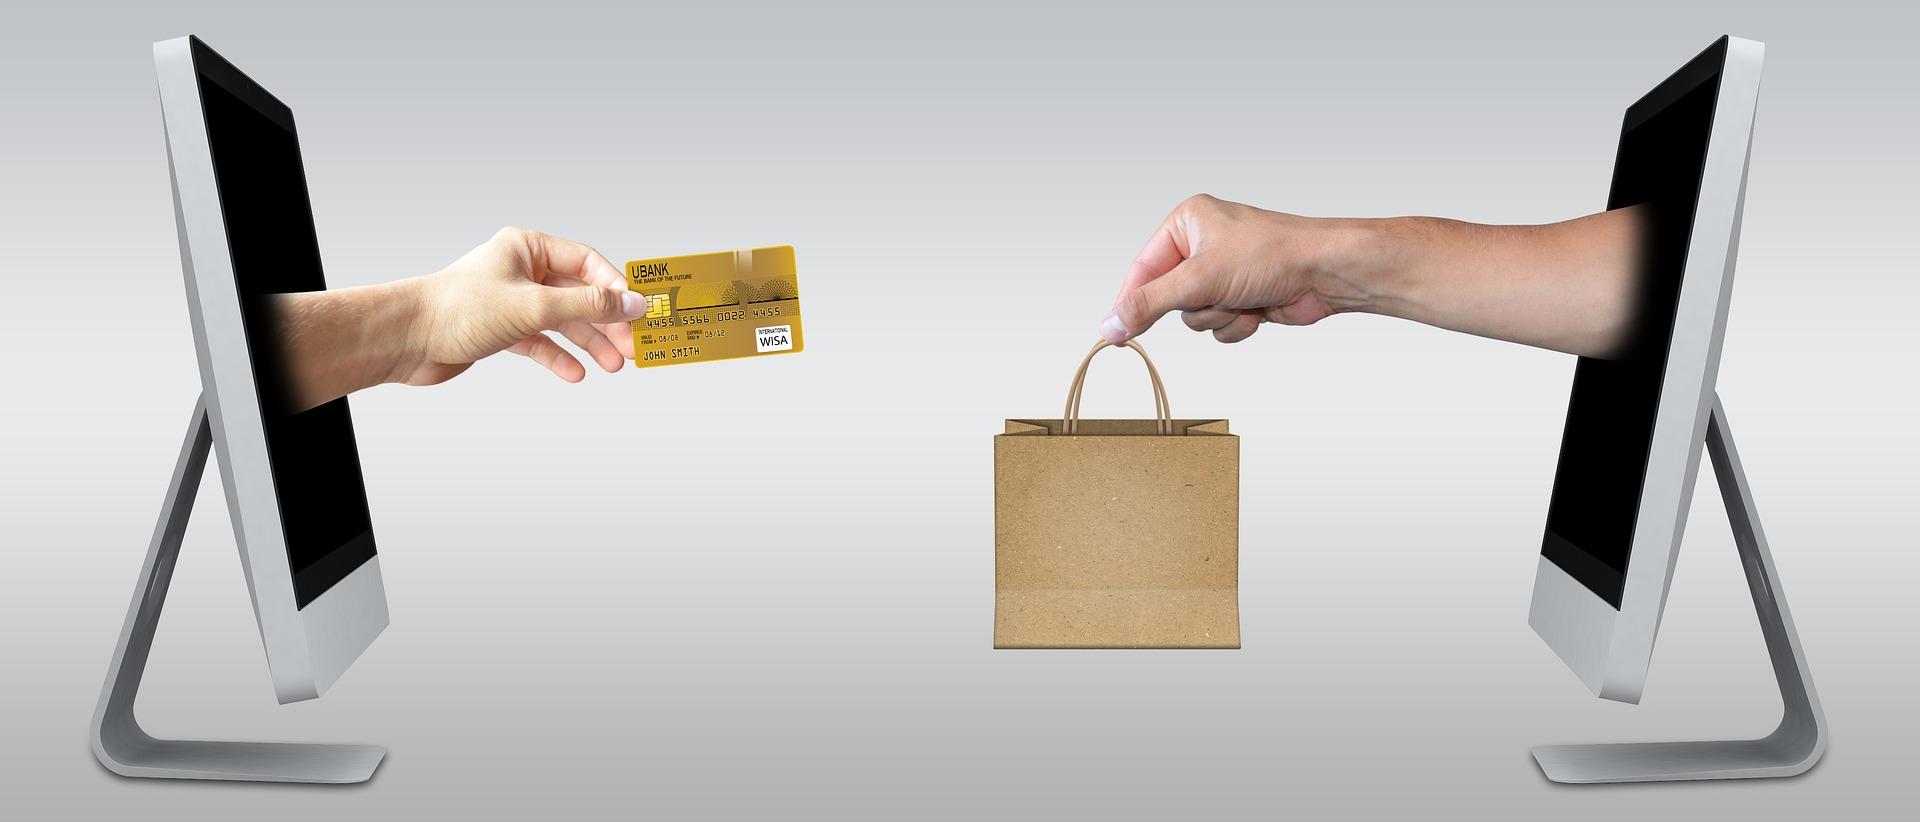 Online_shopping-SimplyDxb.com